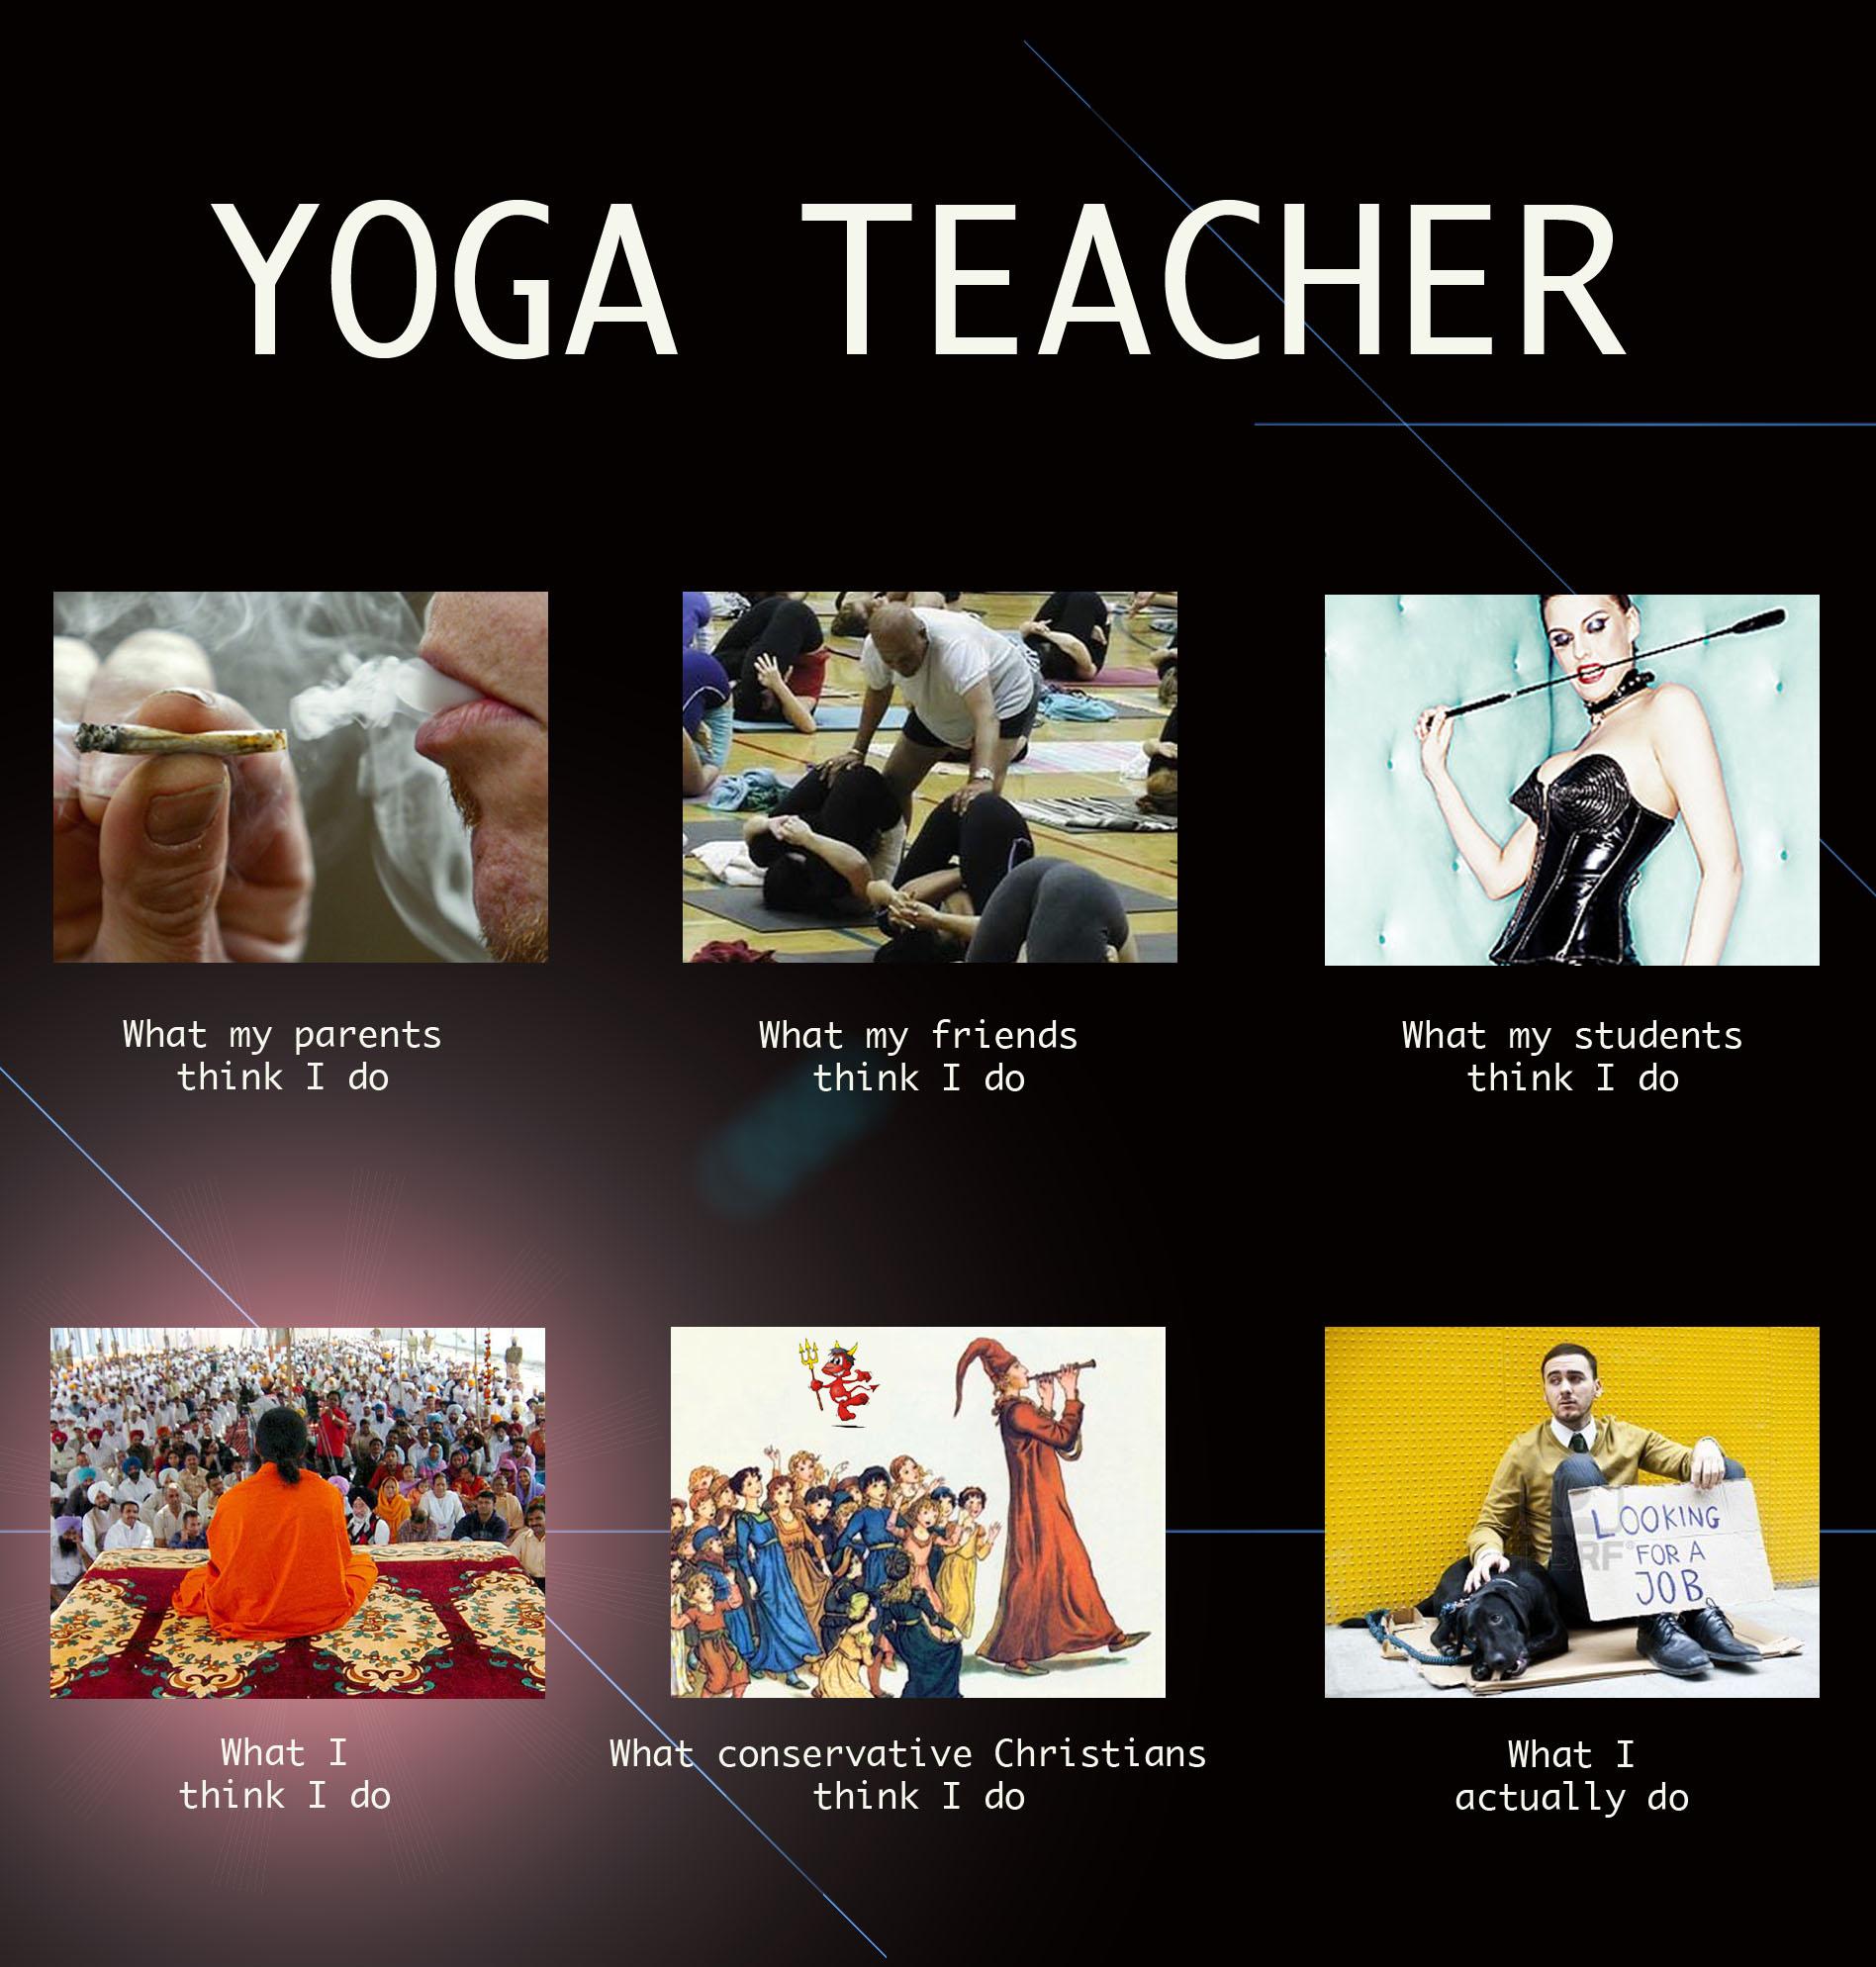 Yoga teacher dating